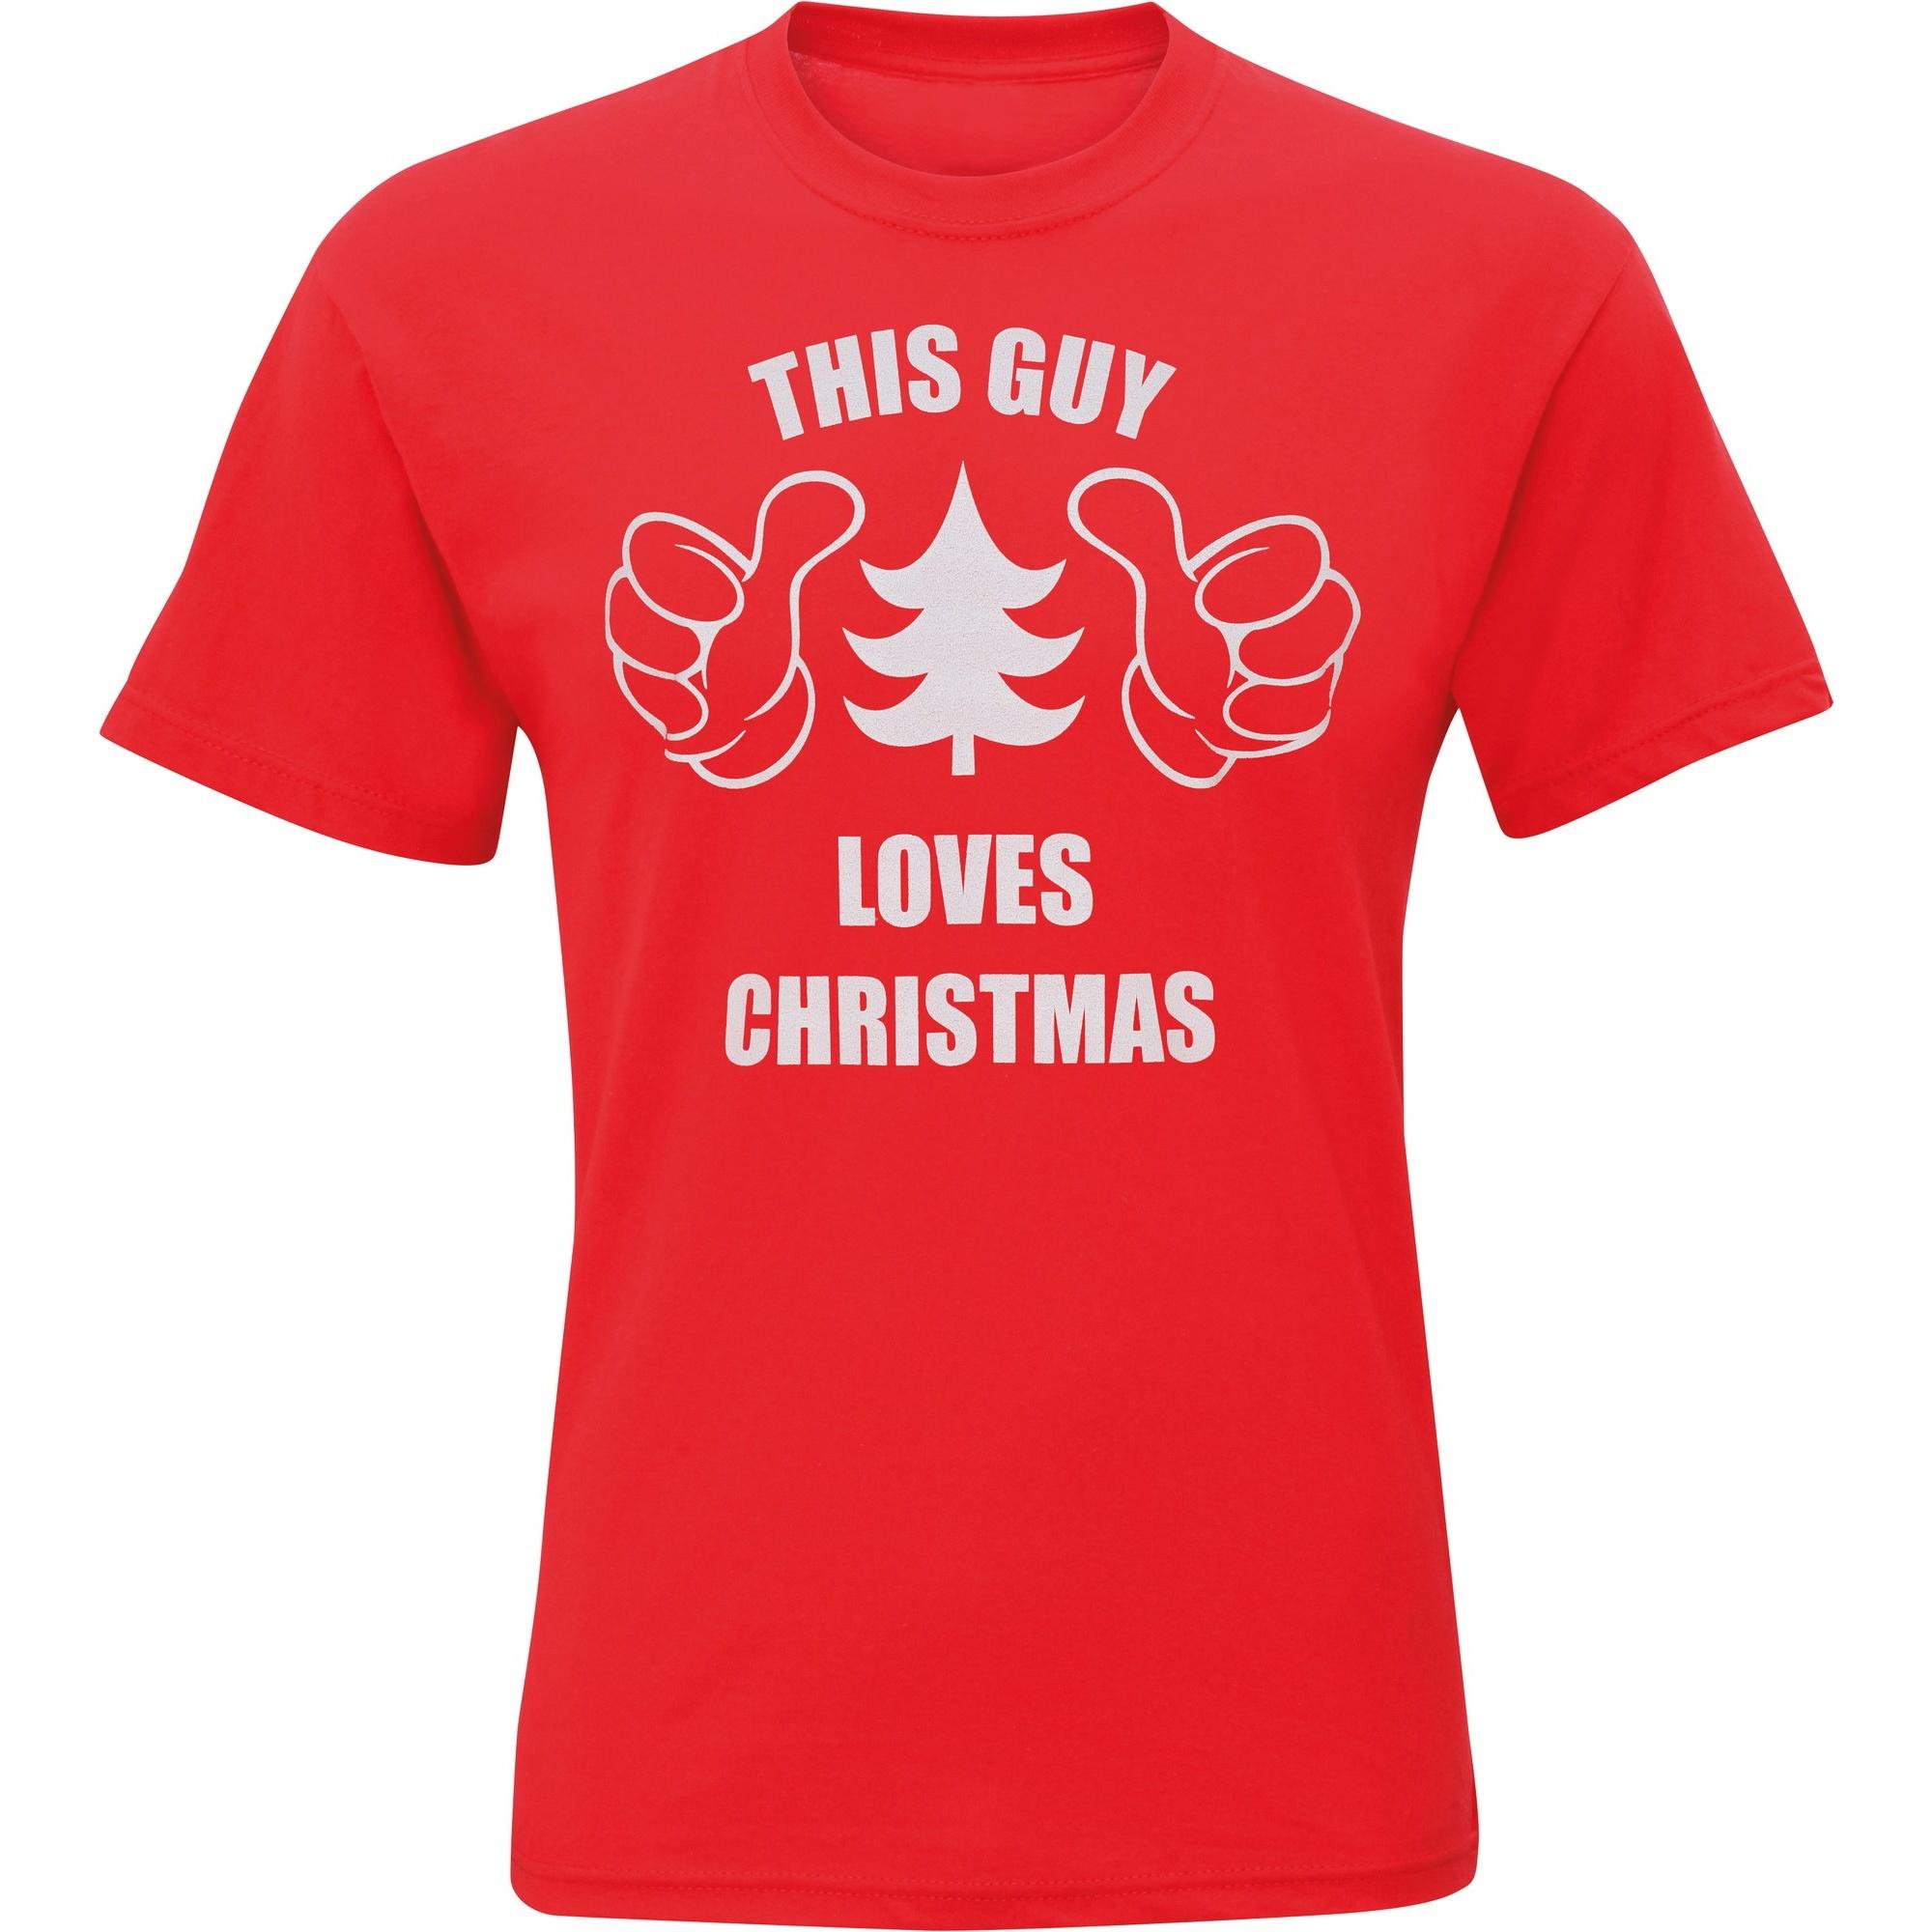 Christmas Shop Mens This Guy Loves Christmas Short Sleeve T-Shirt (L) (Red)